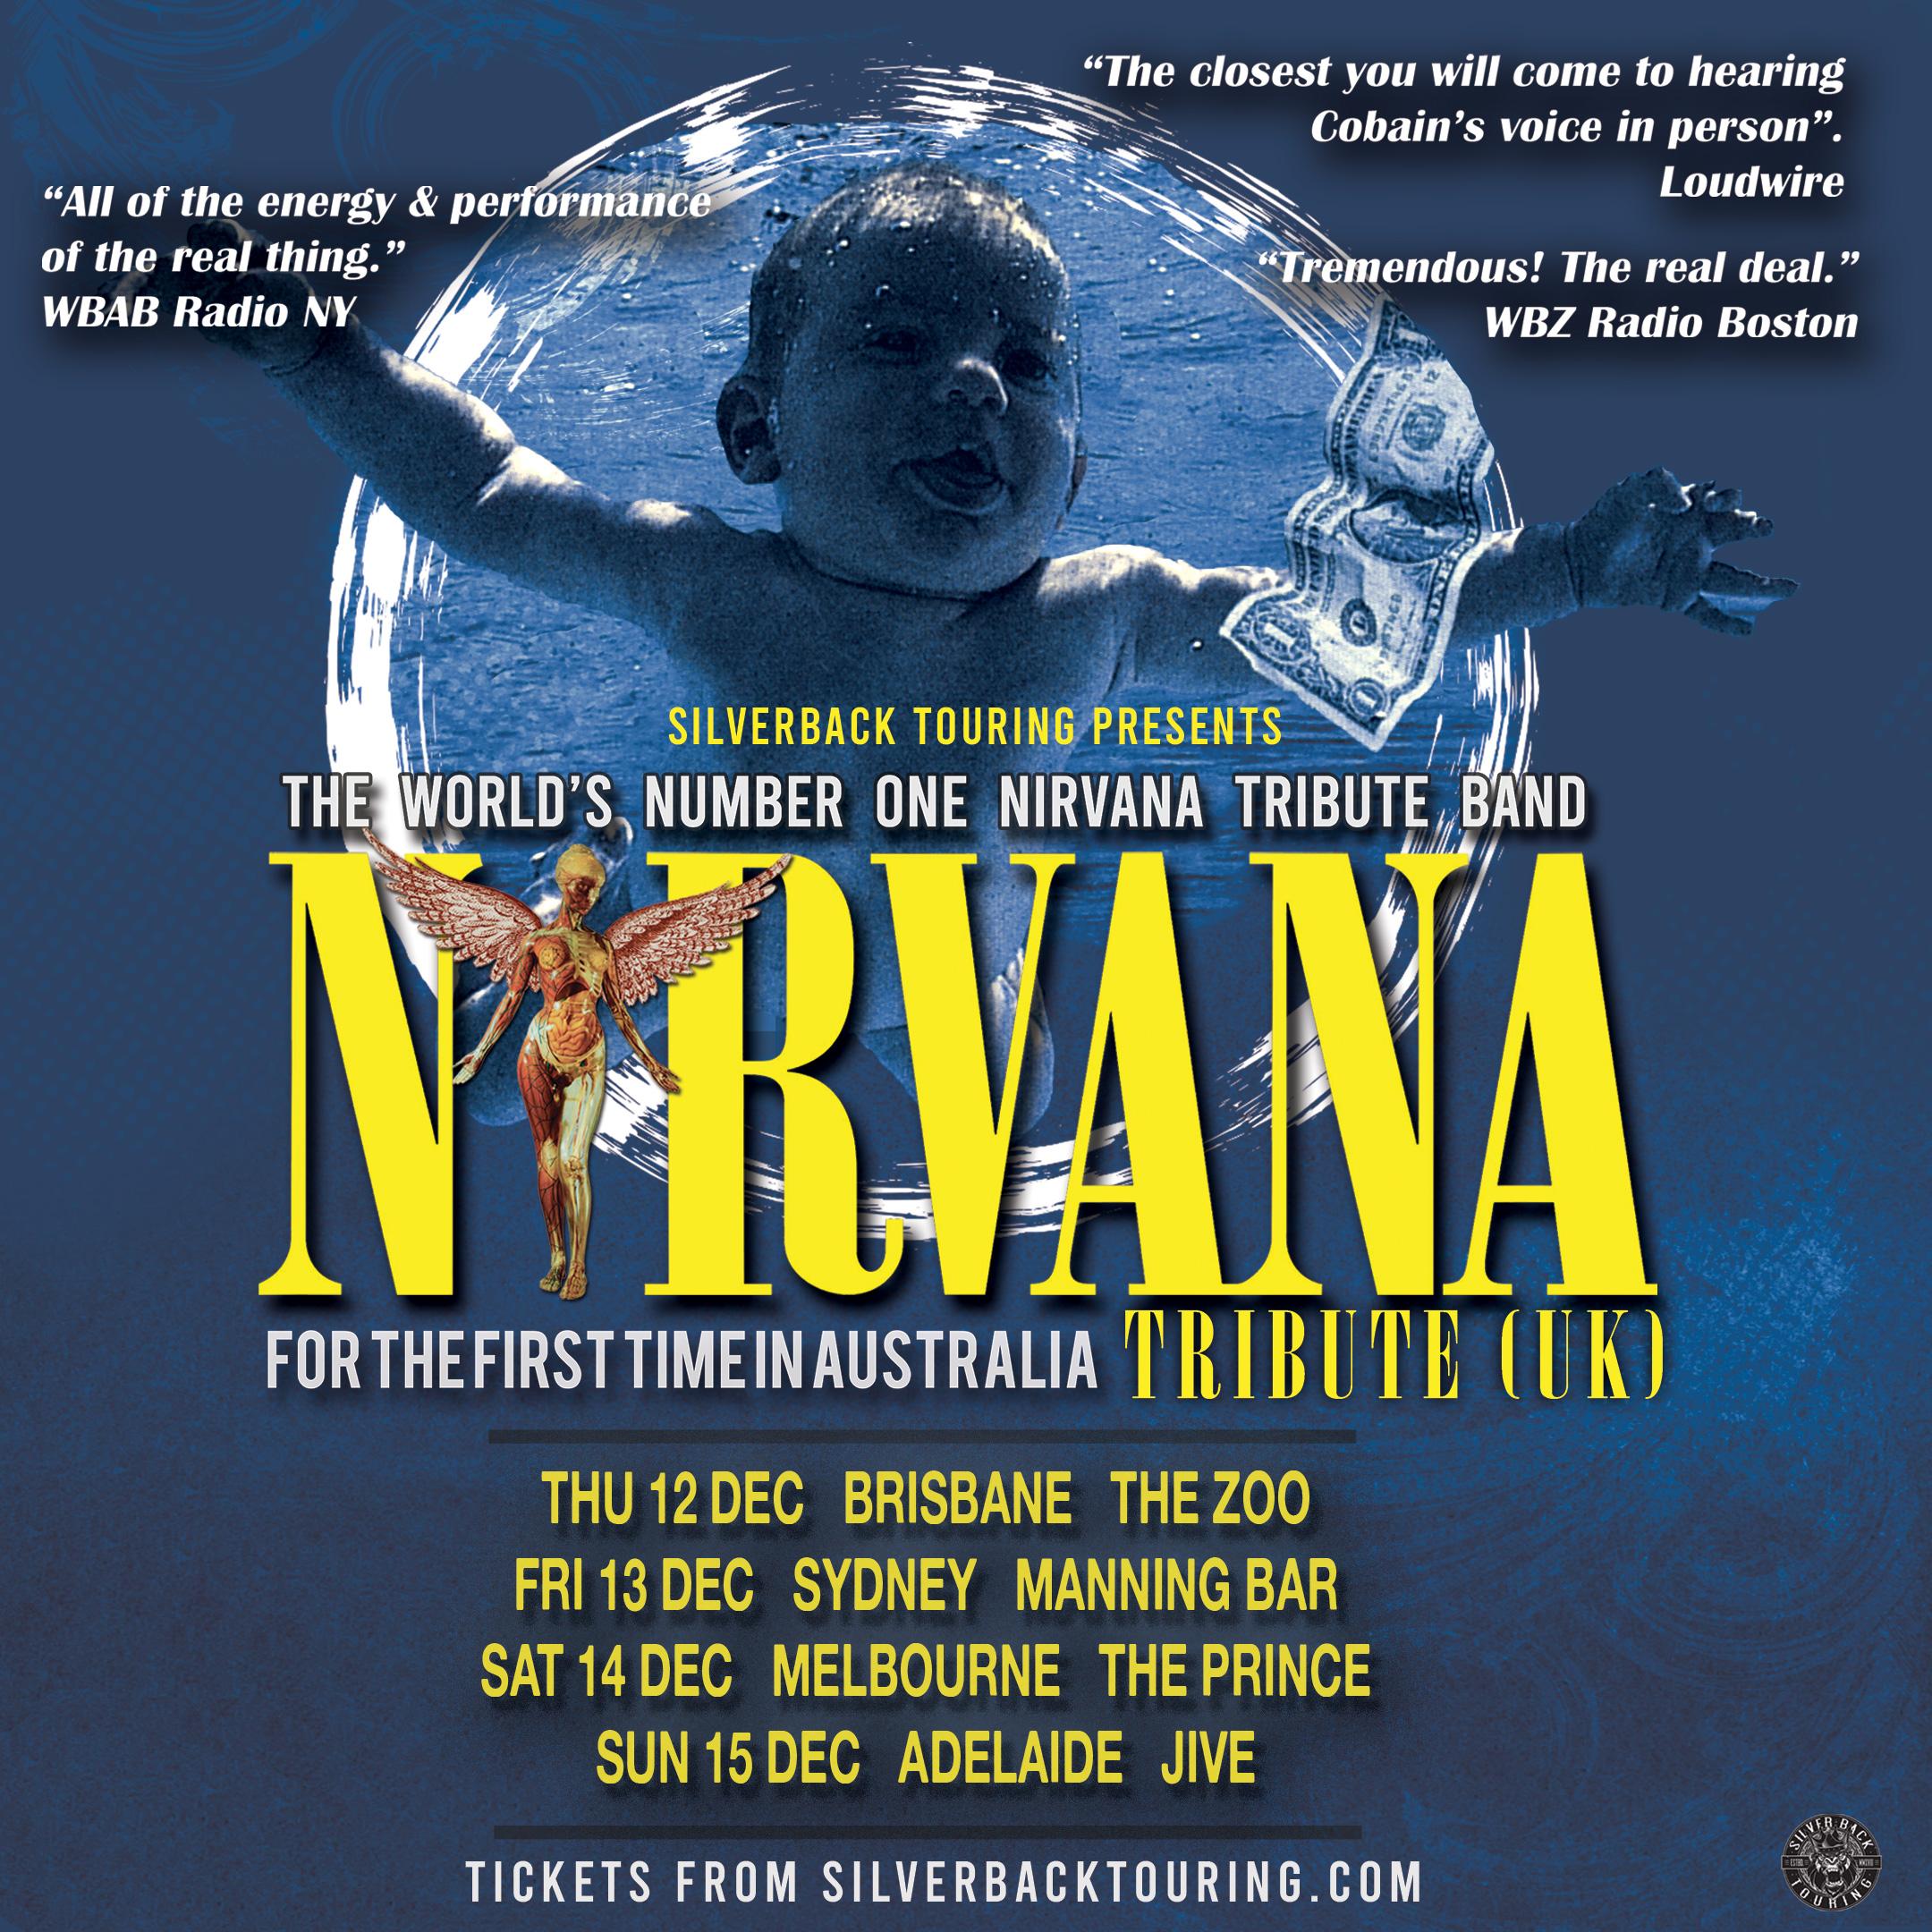 NIRVANA TRIBUTE (UK) tickets (Manning Bar) from Manning Bar